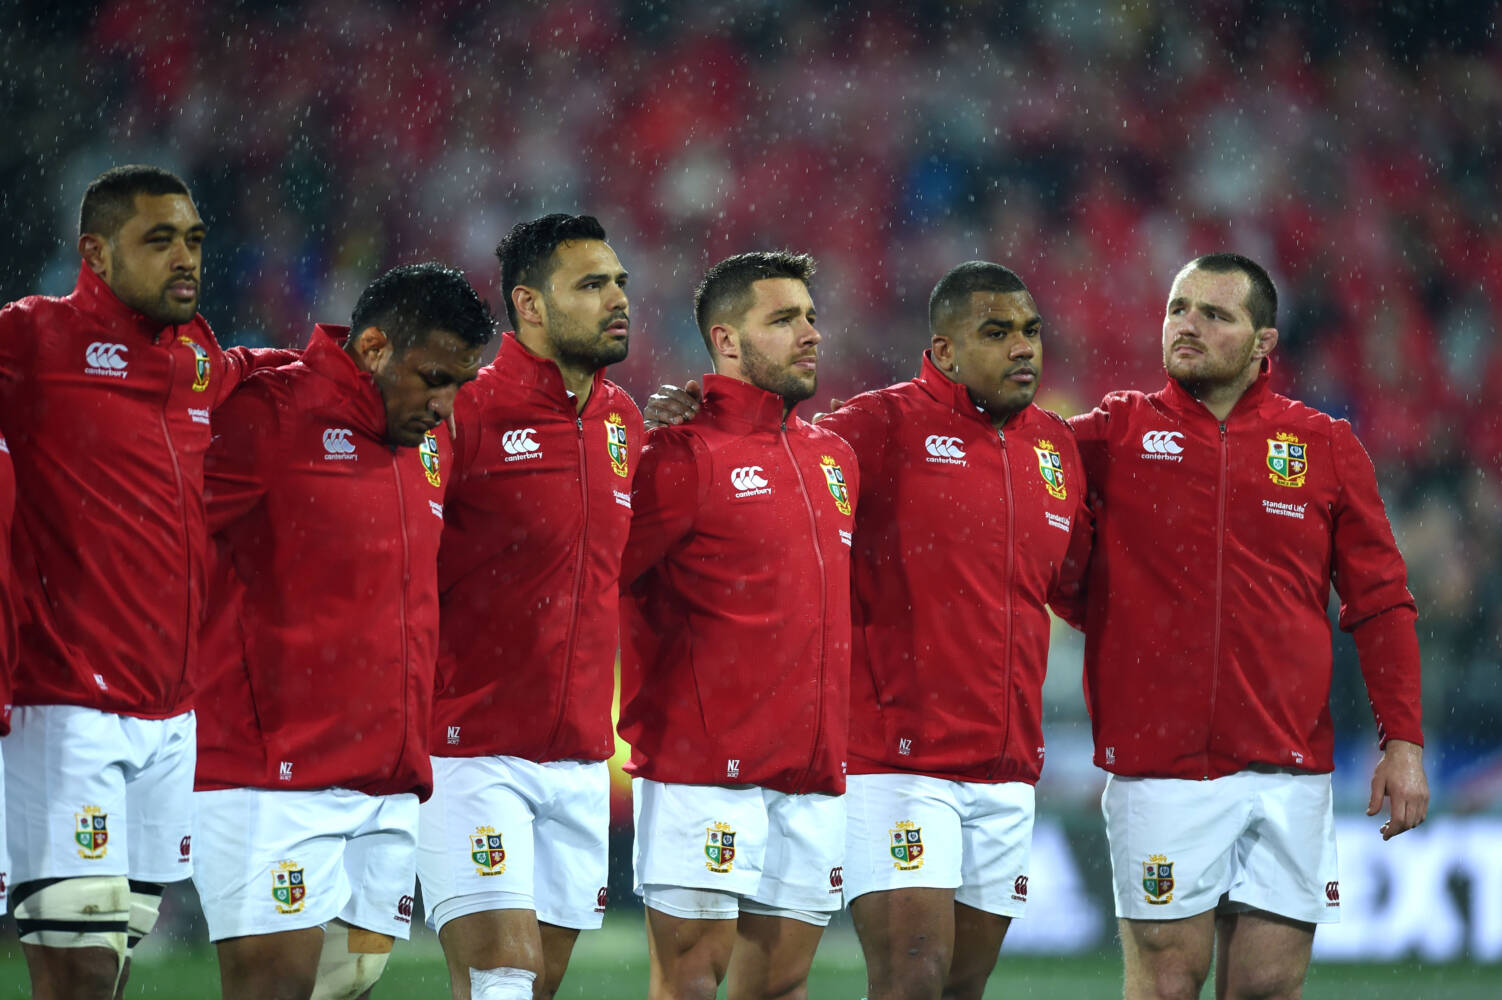 British & Irish Lions announce fixtures for 2021 tour